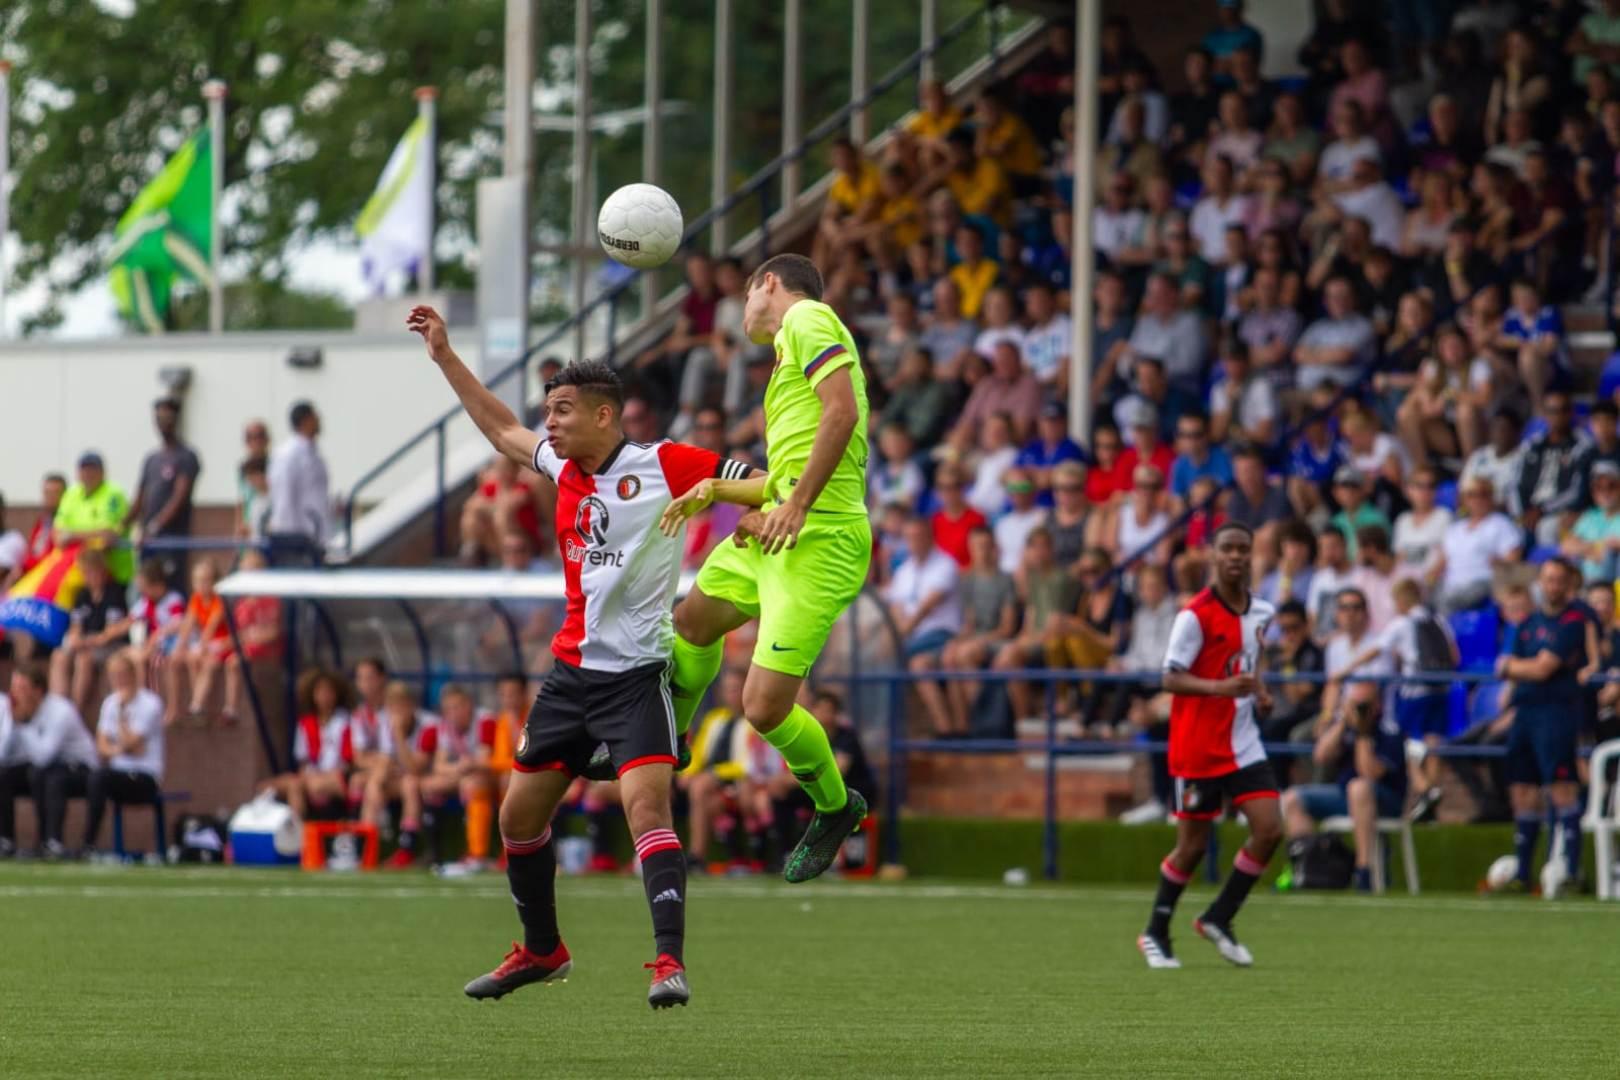 Marveld Tournament 2019 - Feyenoord vs FC Barcelona